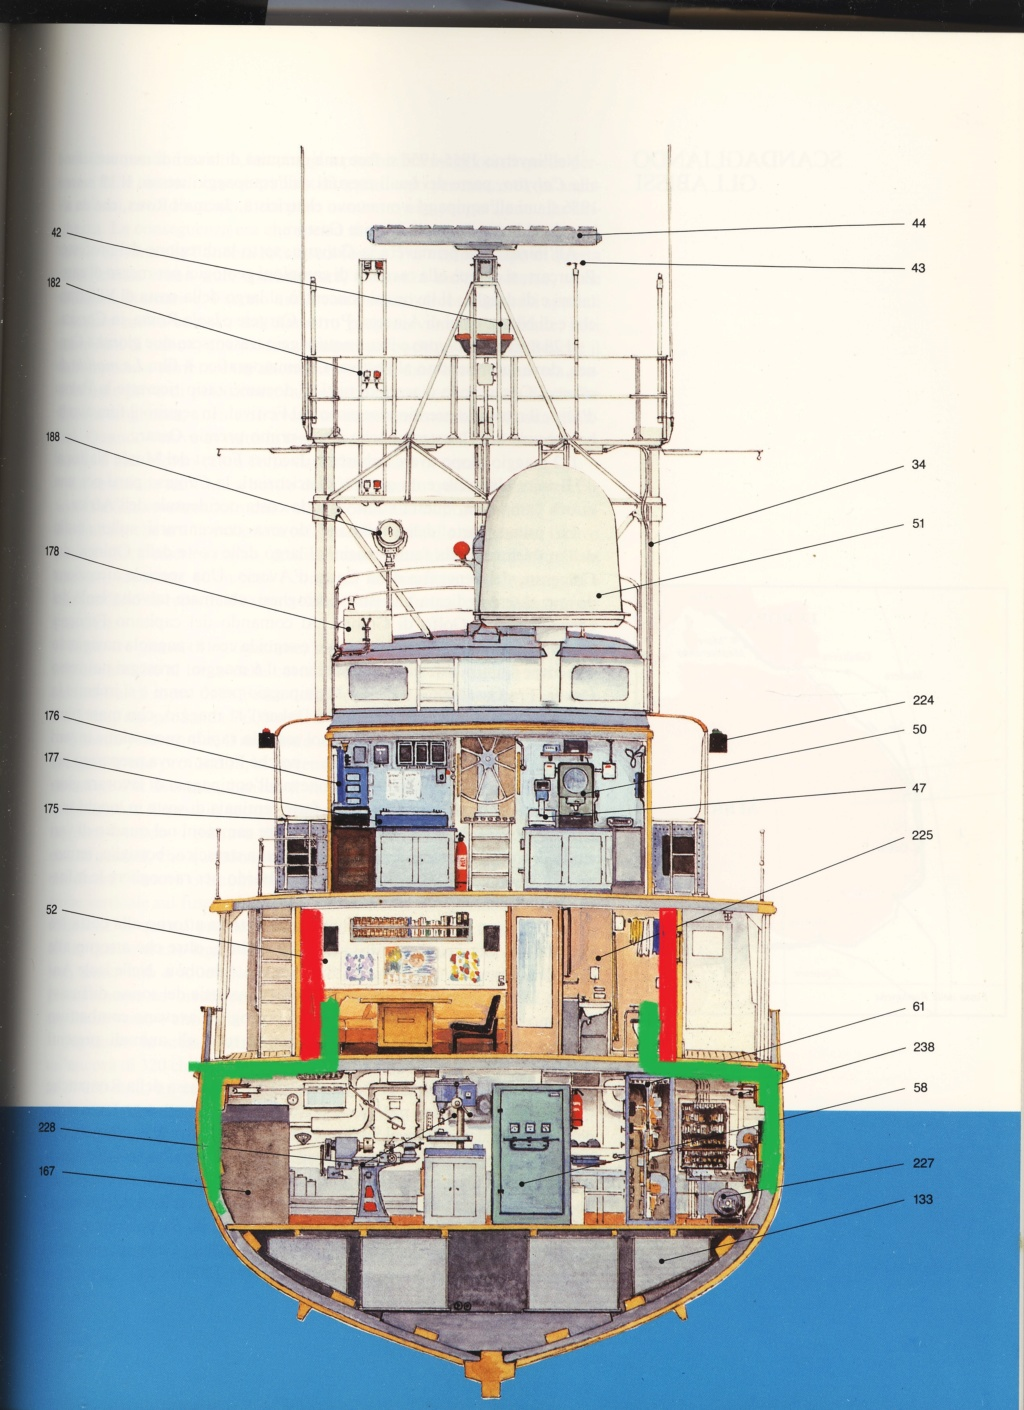 Calypso 1:50 dinamico autocostruito - Pagina 2 Caly10